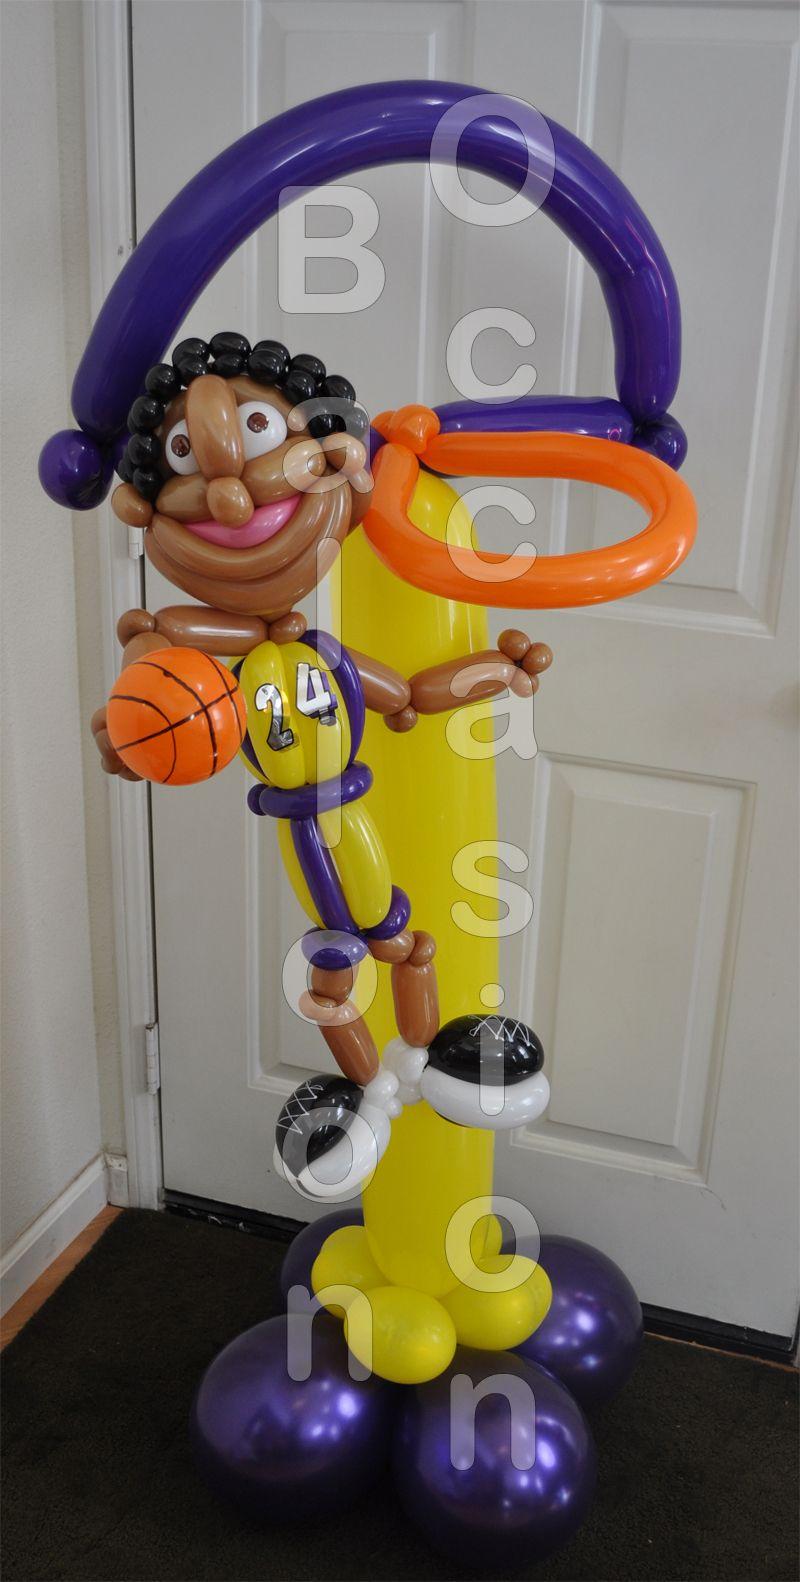 Kobe Slam Dunk Birthday! (With images) Football balloons